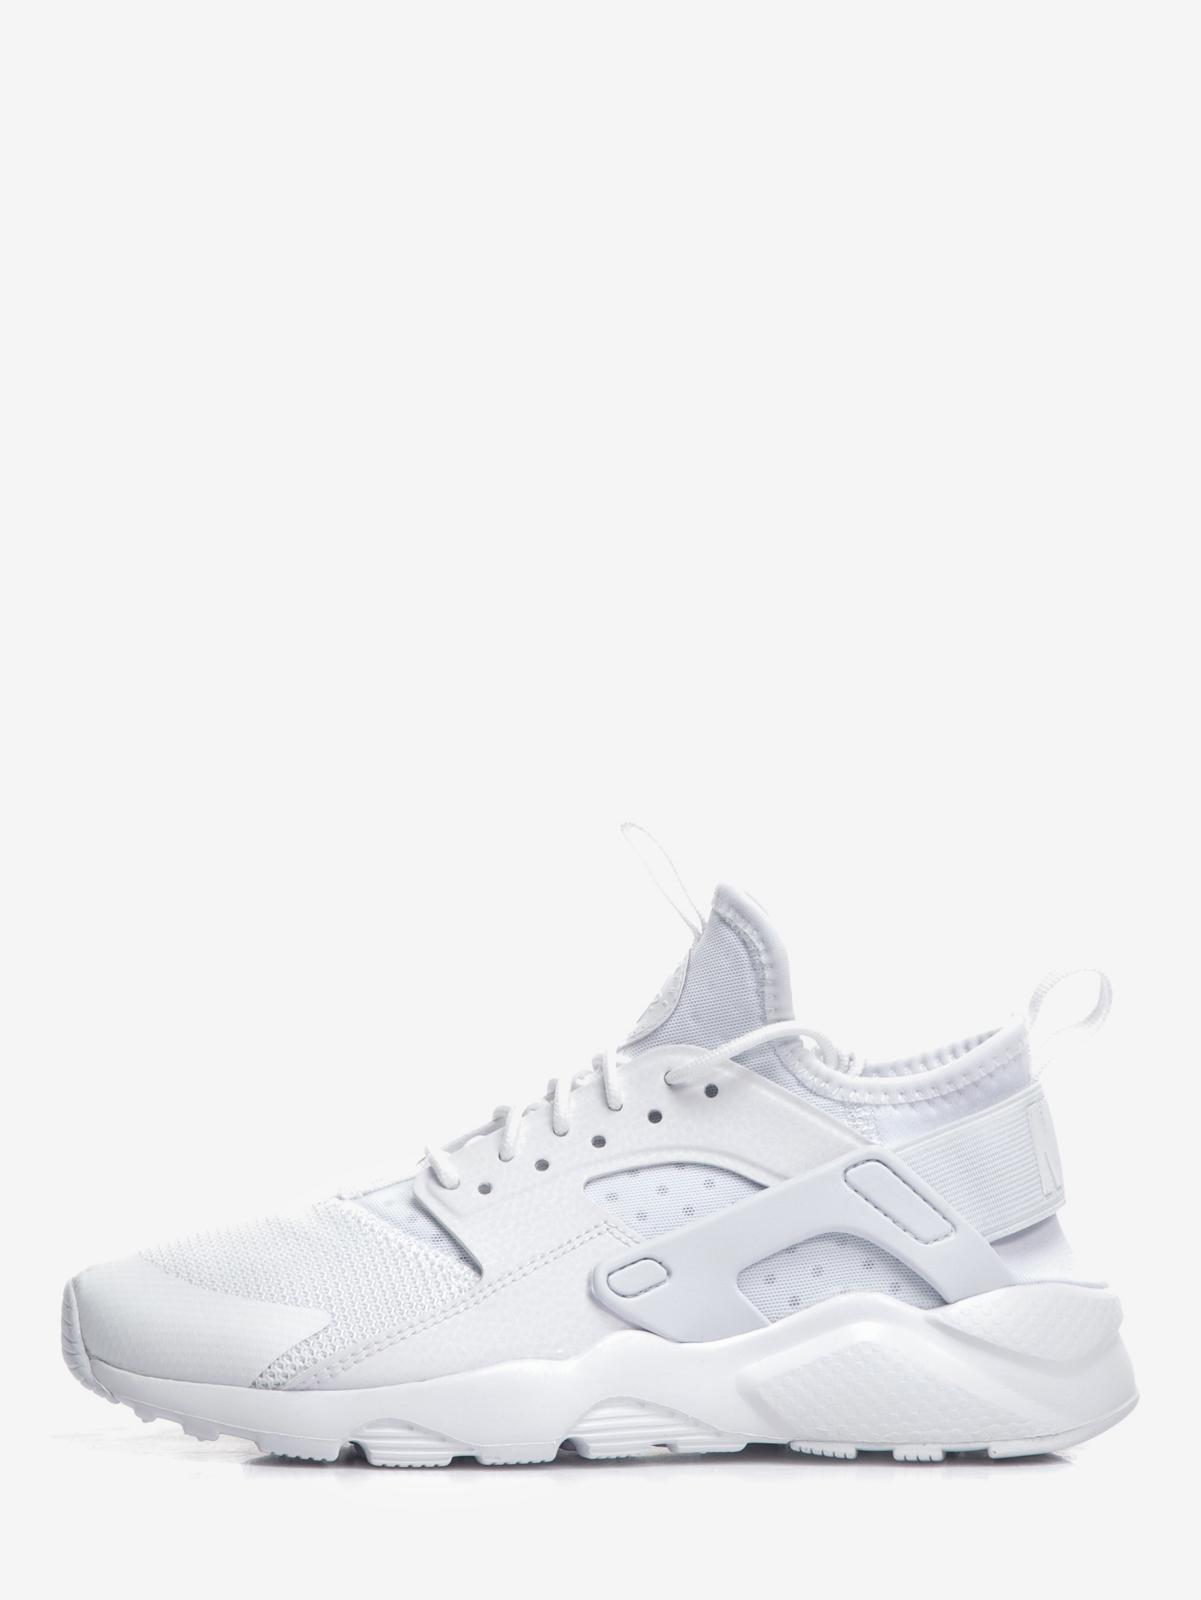 aec5350050c Nike air huarache run ultra gs, naiste vabaajajalatsid nike | Newmood